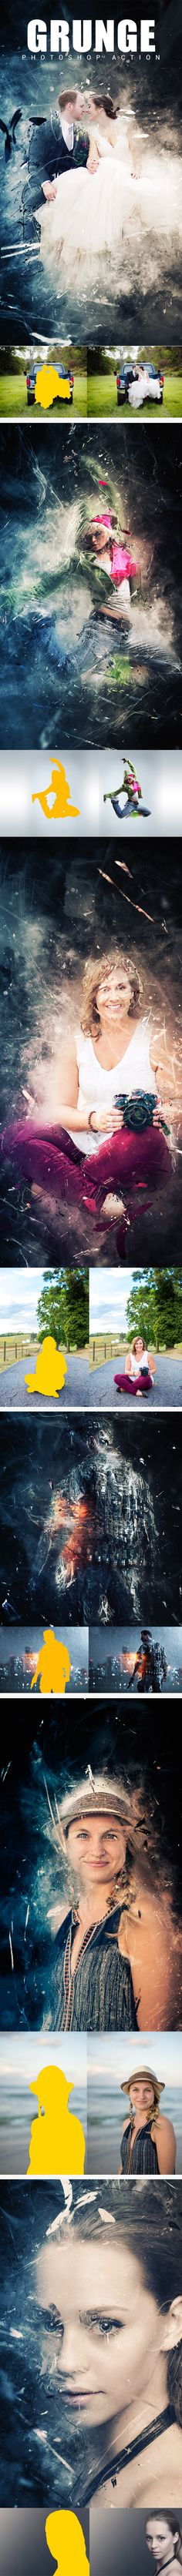 Grunge Photoshop Action. Download here: https://graphicriver.net/item/grunge-photoshop-action/17621840?ref=ksioks